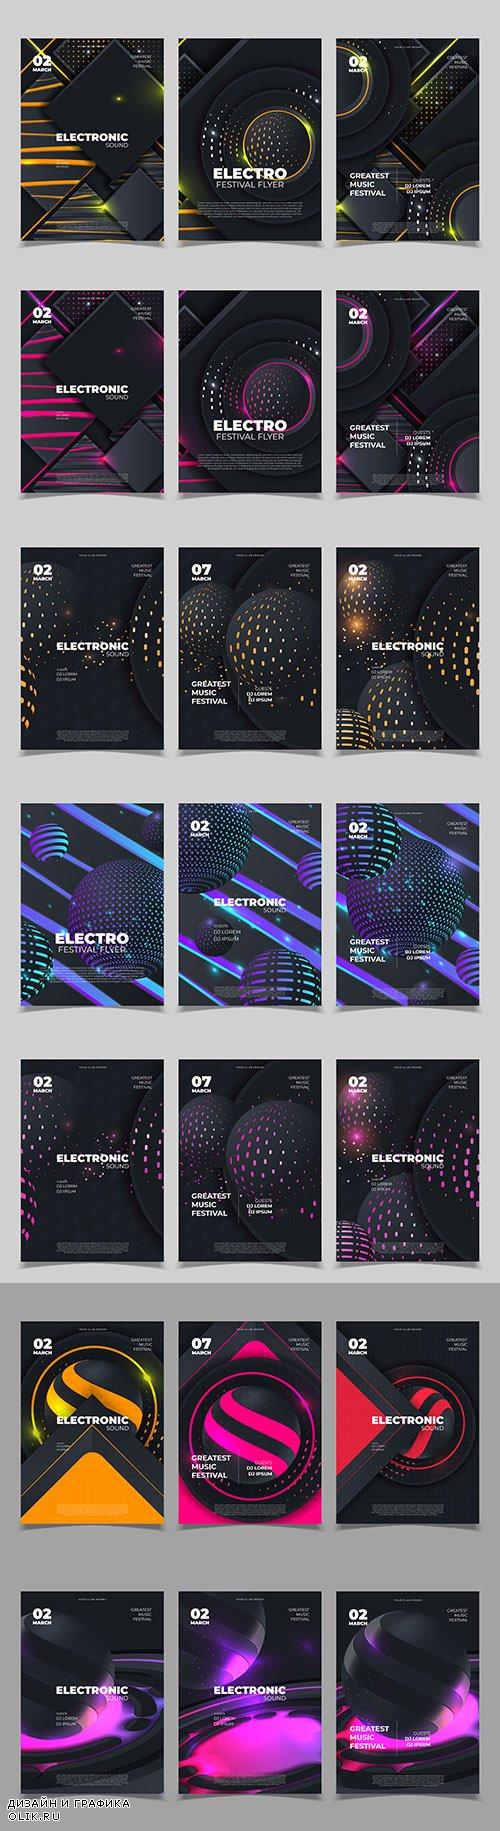 Electronic sound creative music festival design banner